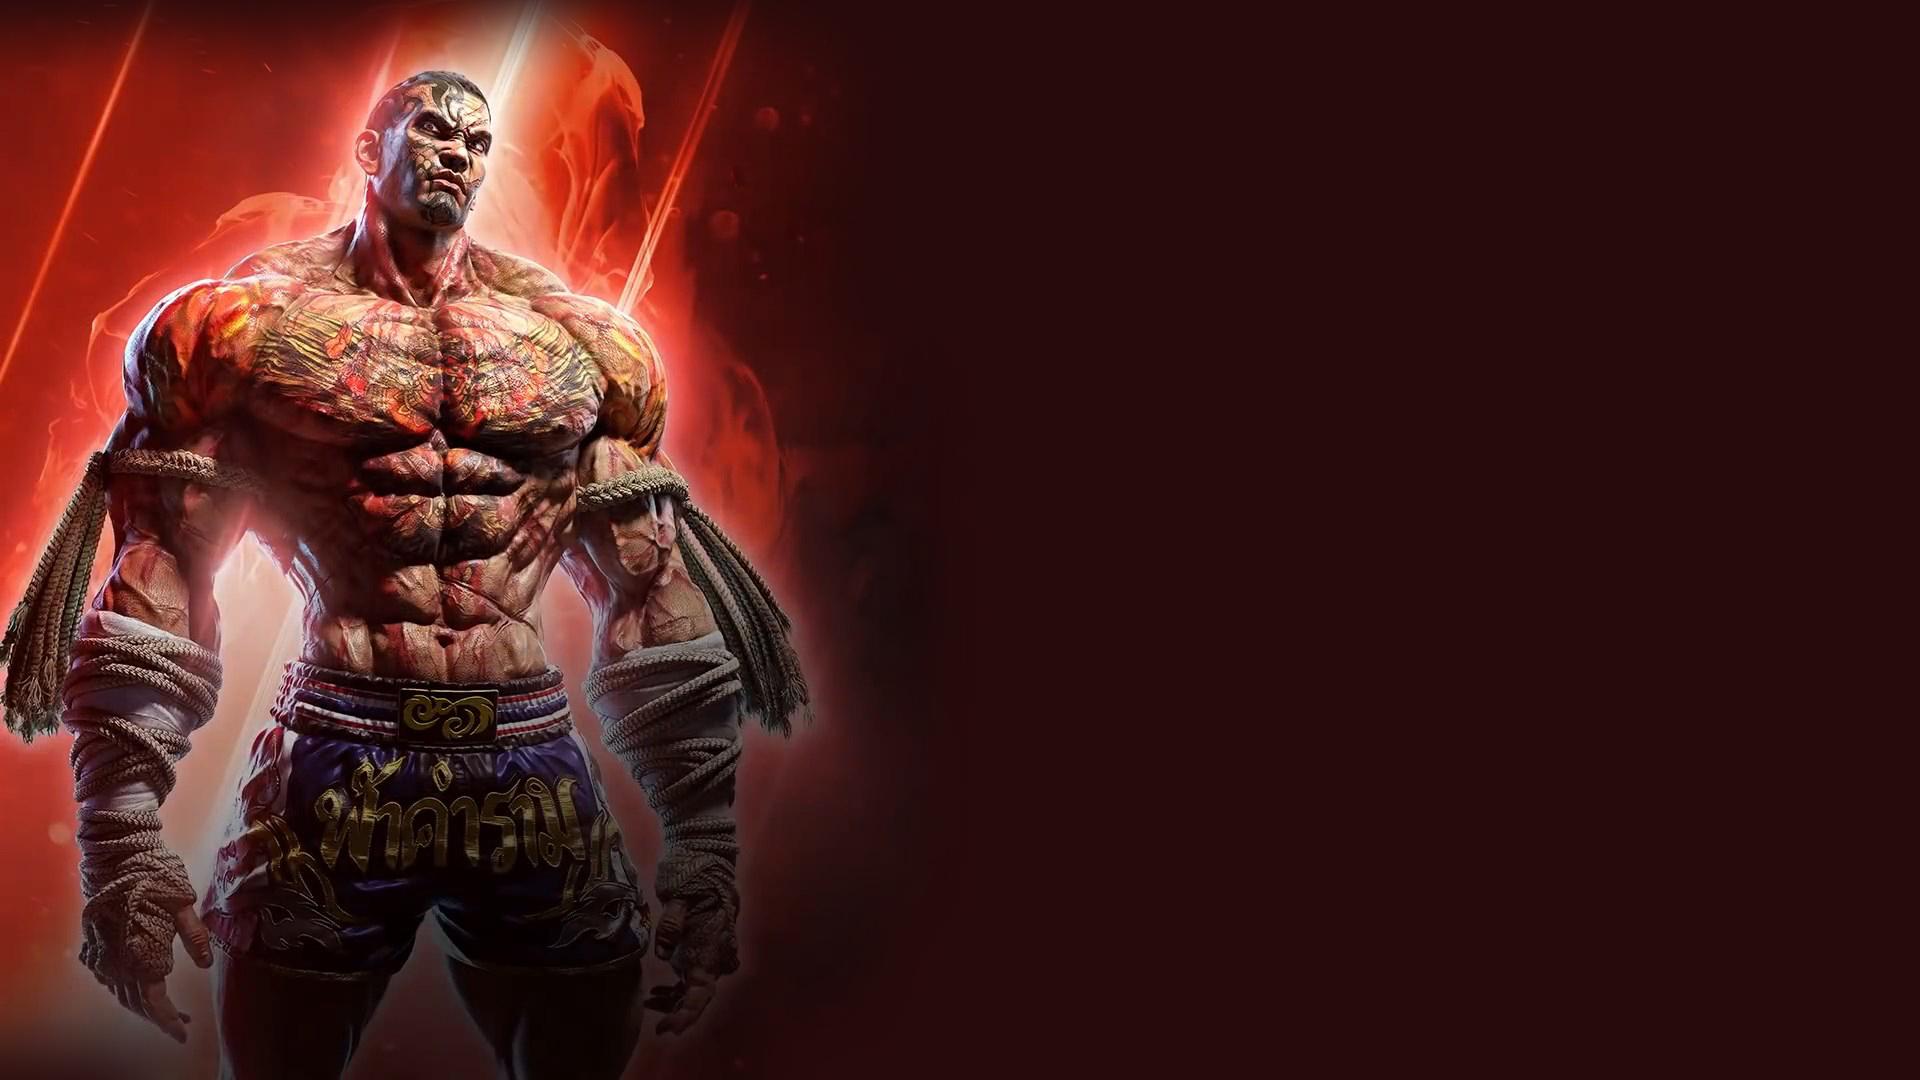 Fahkumram Tekken 7 Wallpaper, HD Games 4K Wallpapers ...